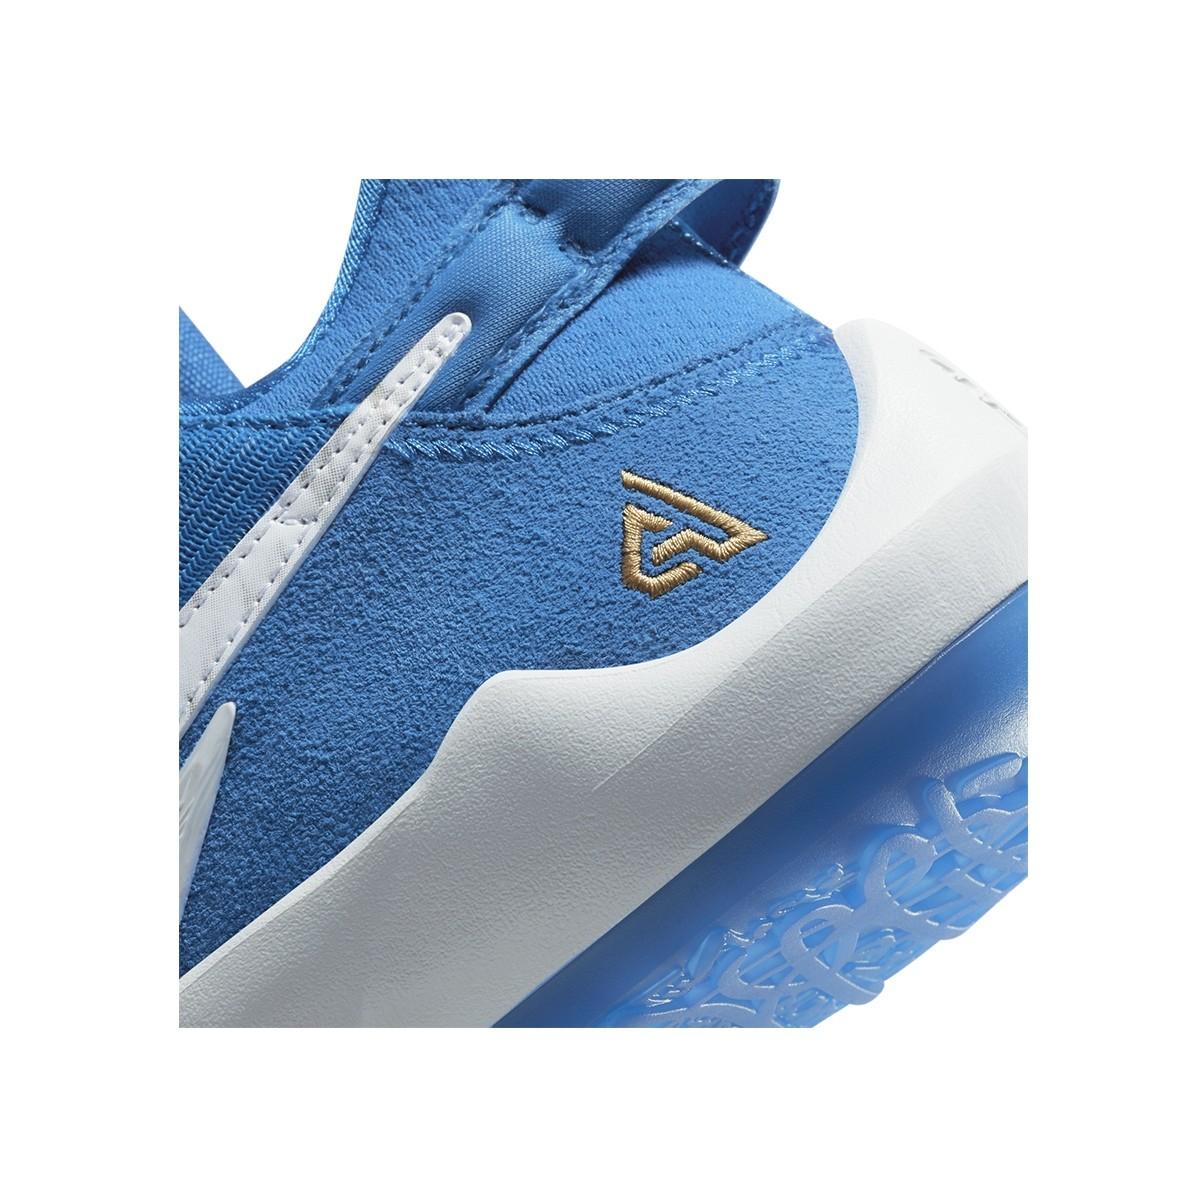 Nike Zoom Freak 2 Jr 'Signal Blue'-CZ4177-408